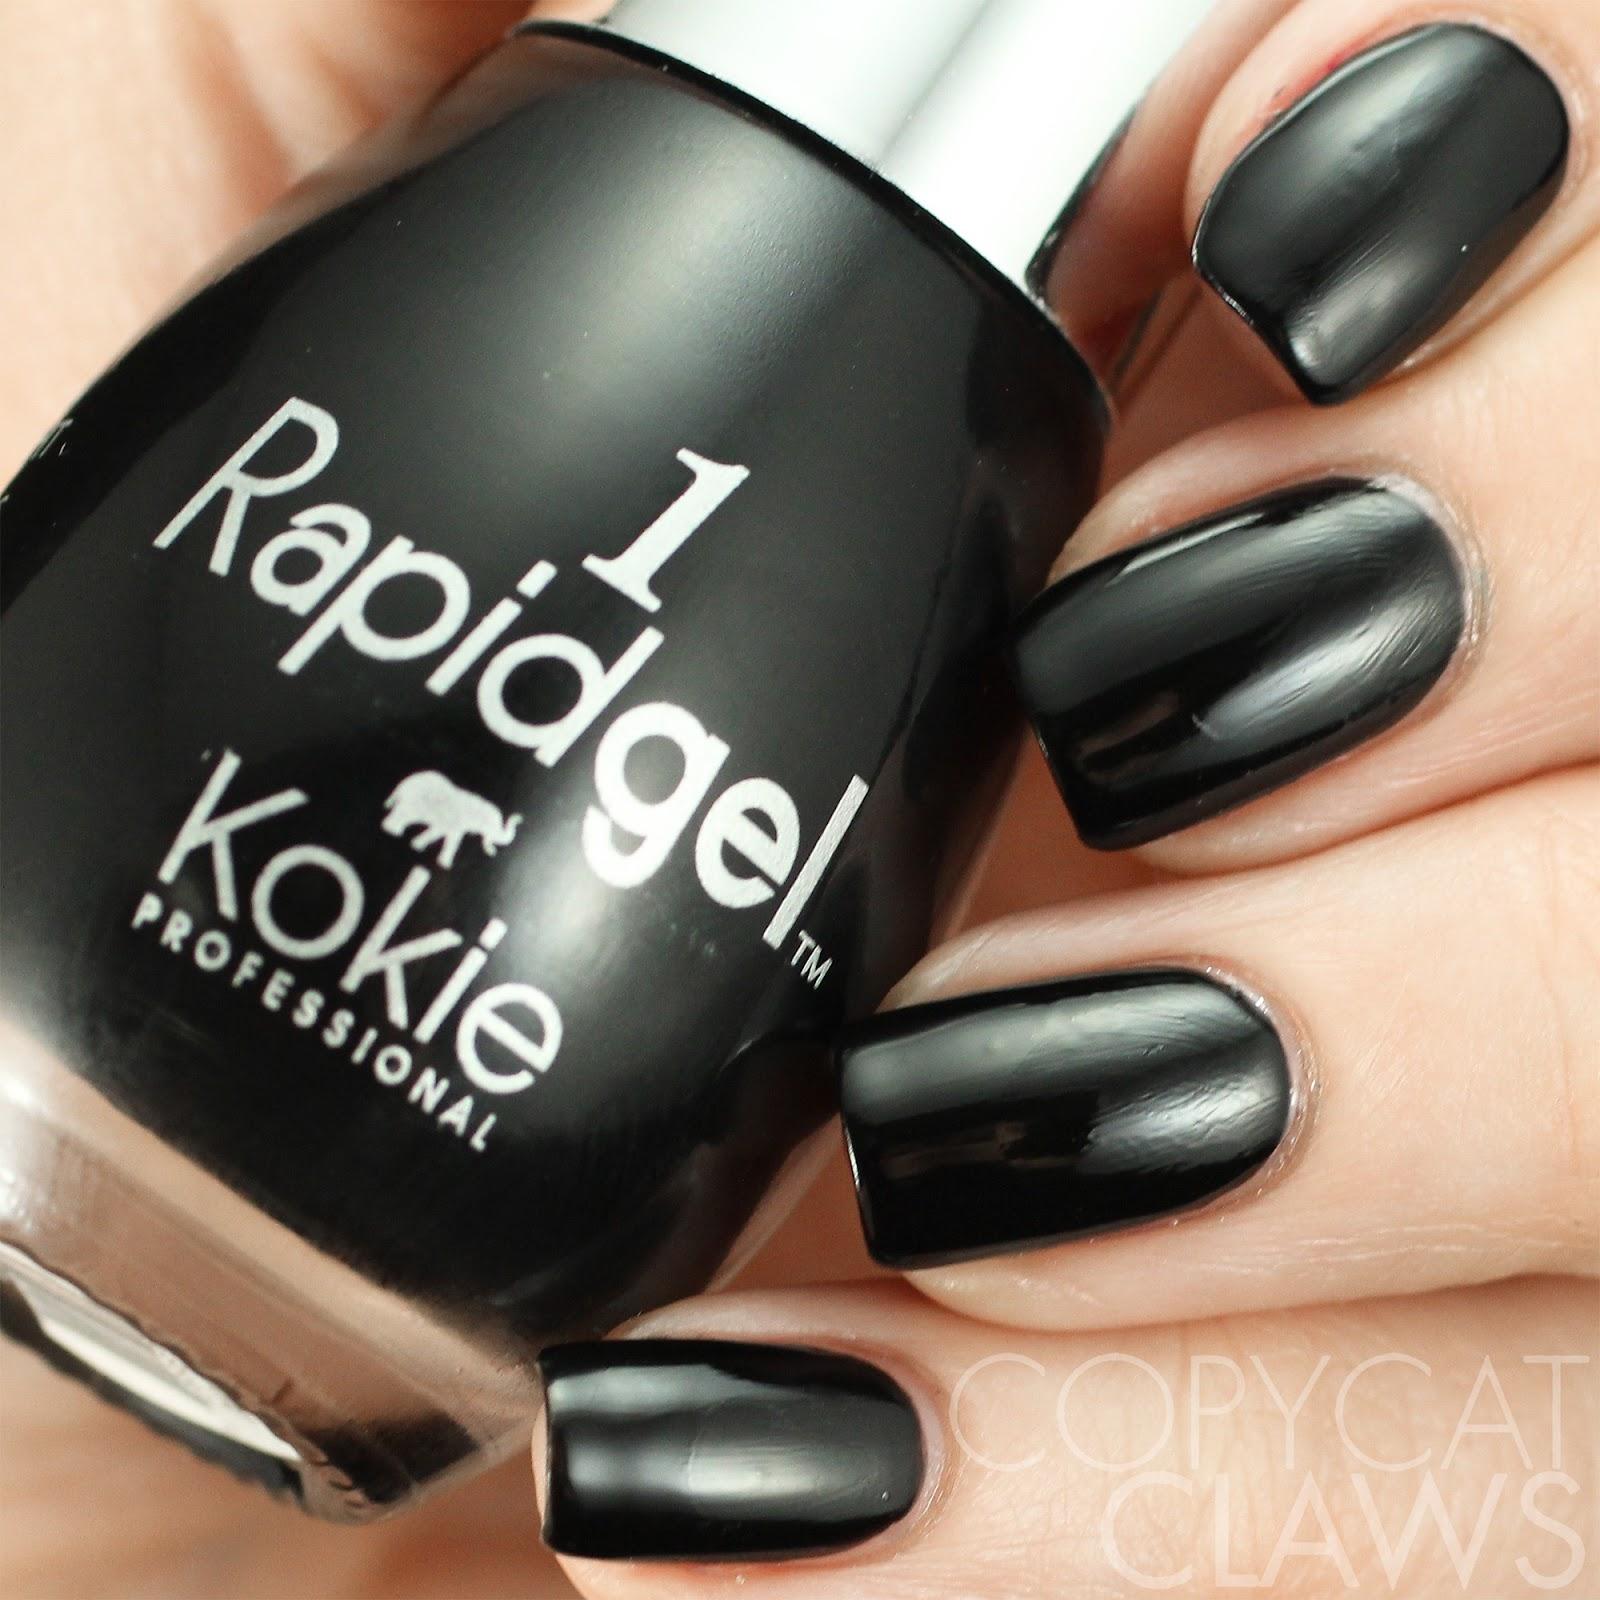 Copycat Claws: Kokie Cosmetics Nail Polish Review